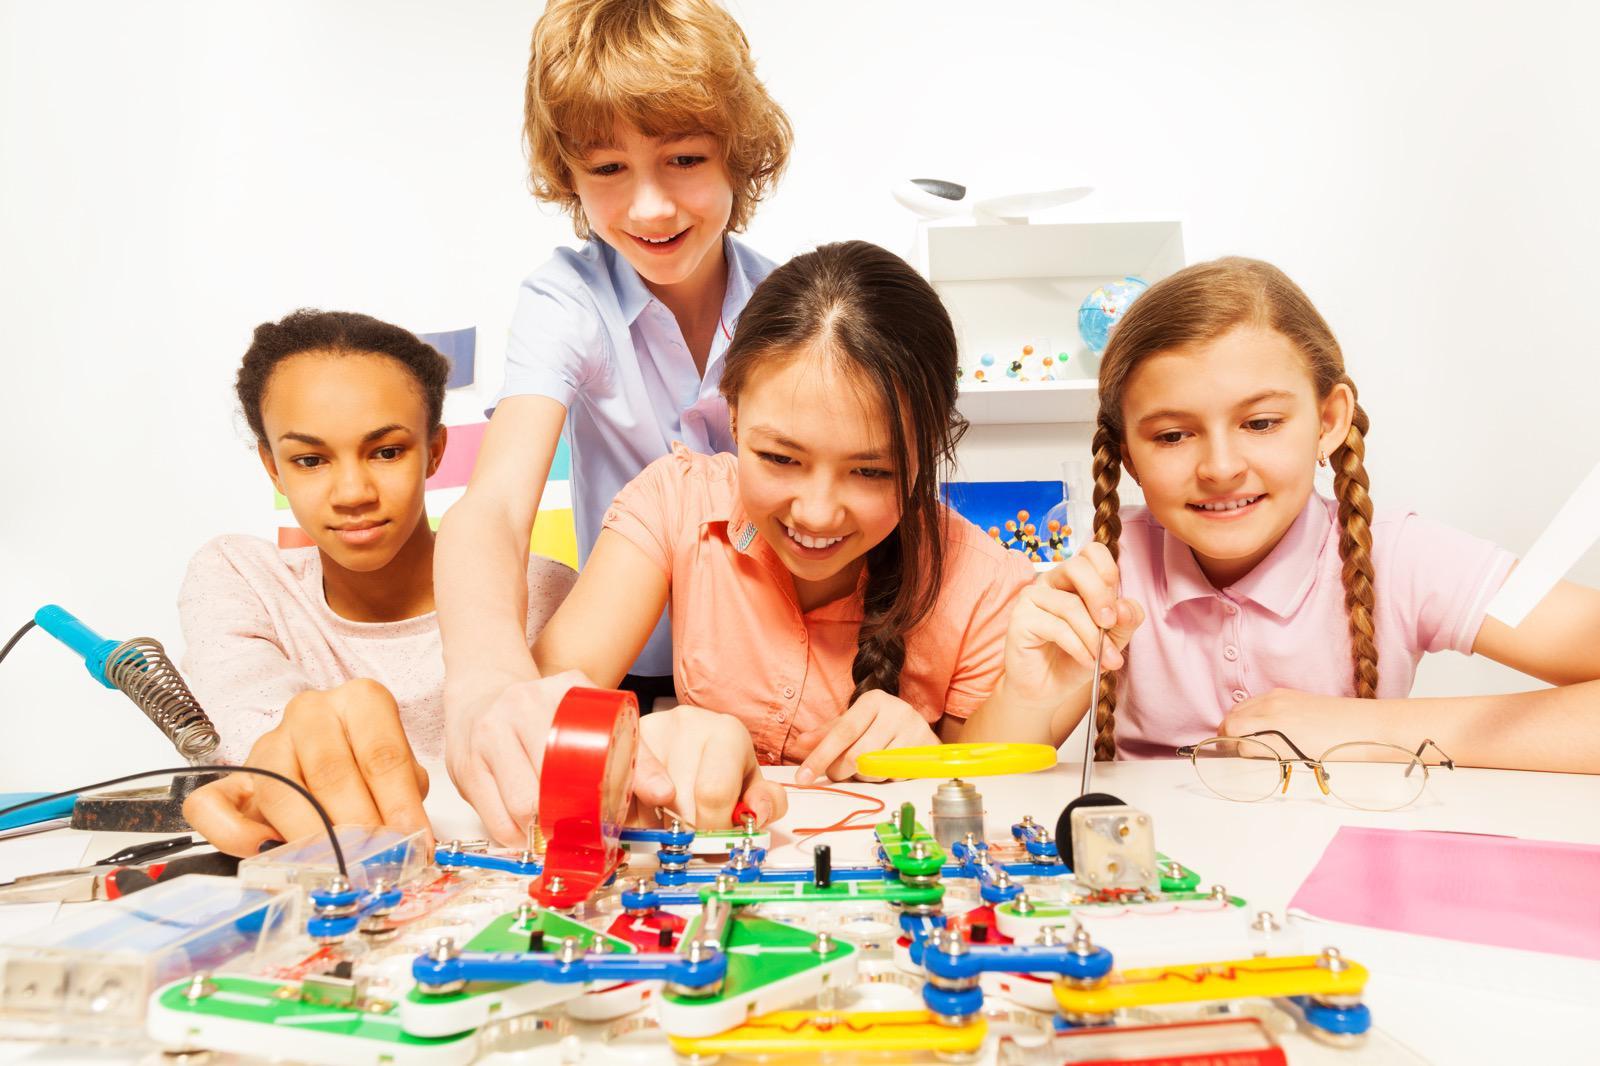 Science Cosmos Kids Lego Robotics Games Programming Classes